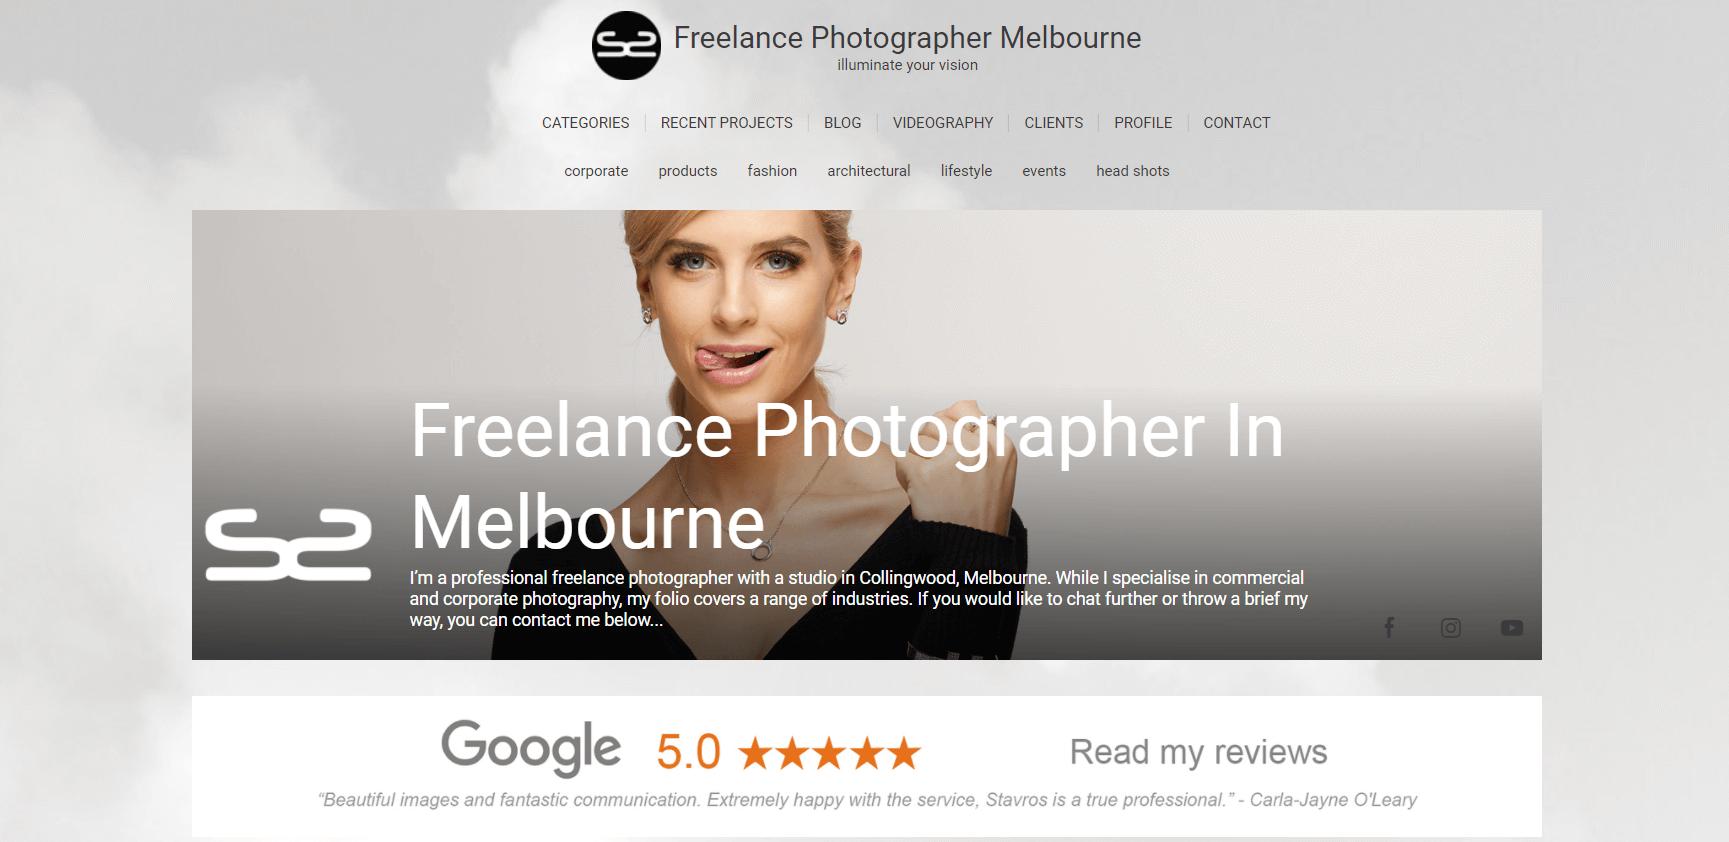 Freelance Photograper Melbourne